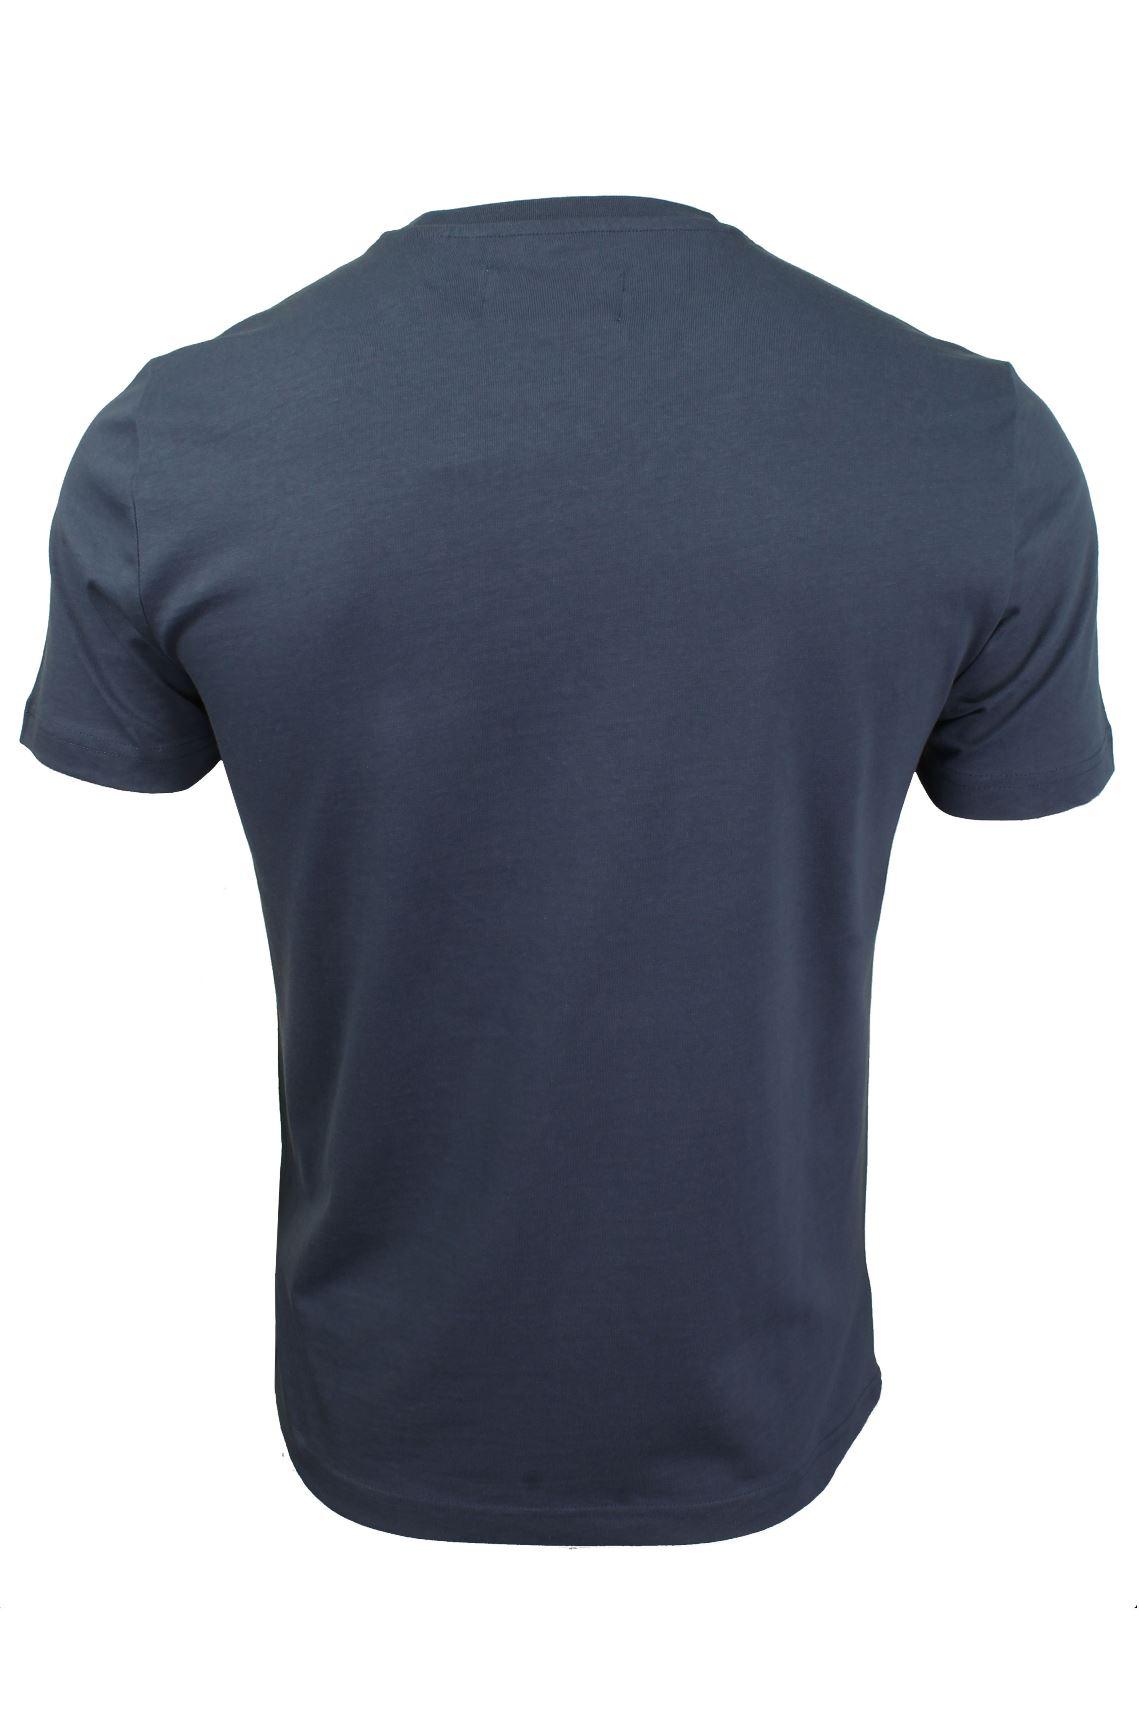 Mens-T-Shirt-by-Original-Penguin-Crew-Neck-Short-Sleeved thumbnail 56